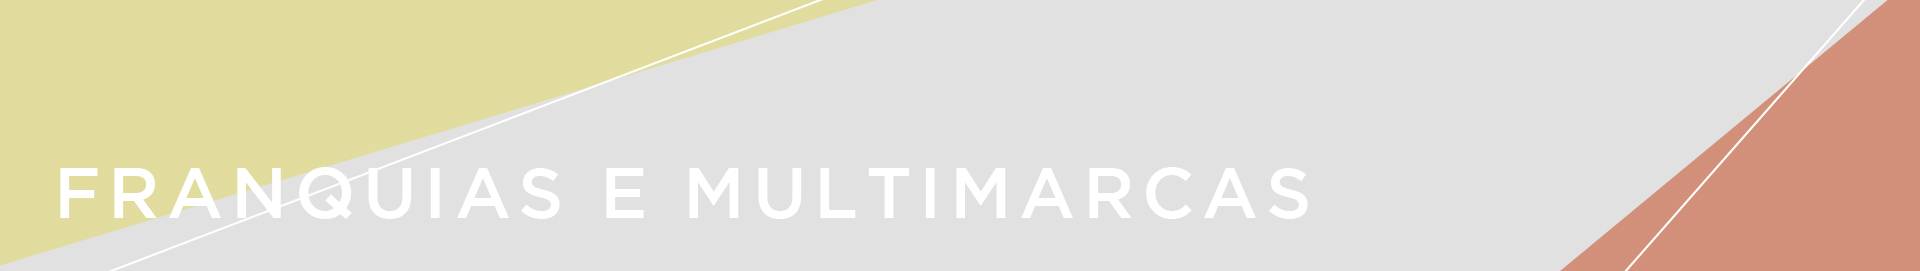 Banner topo Franquias e Multimarcas